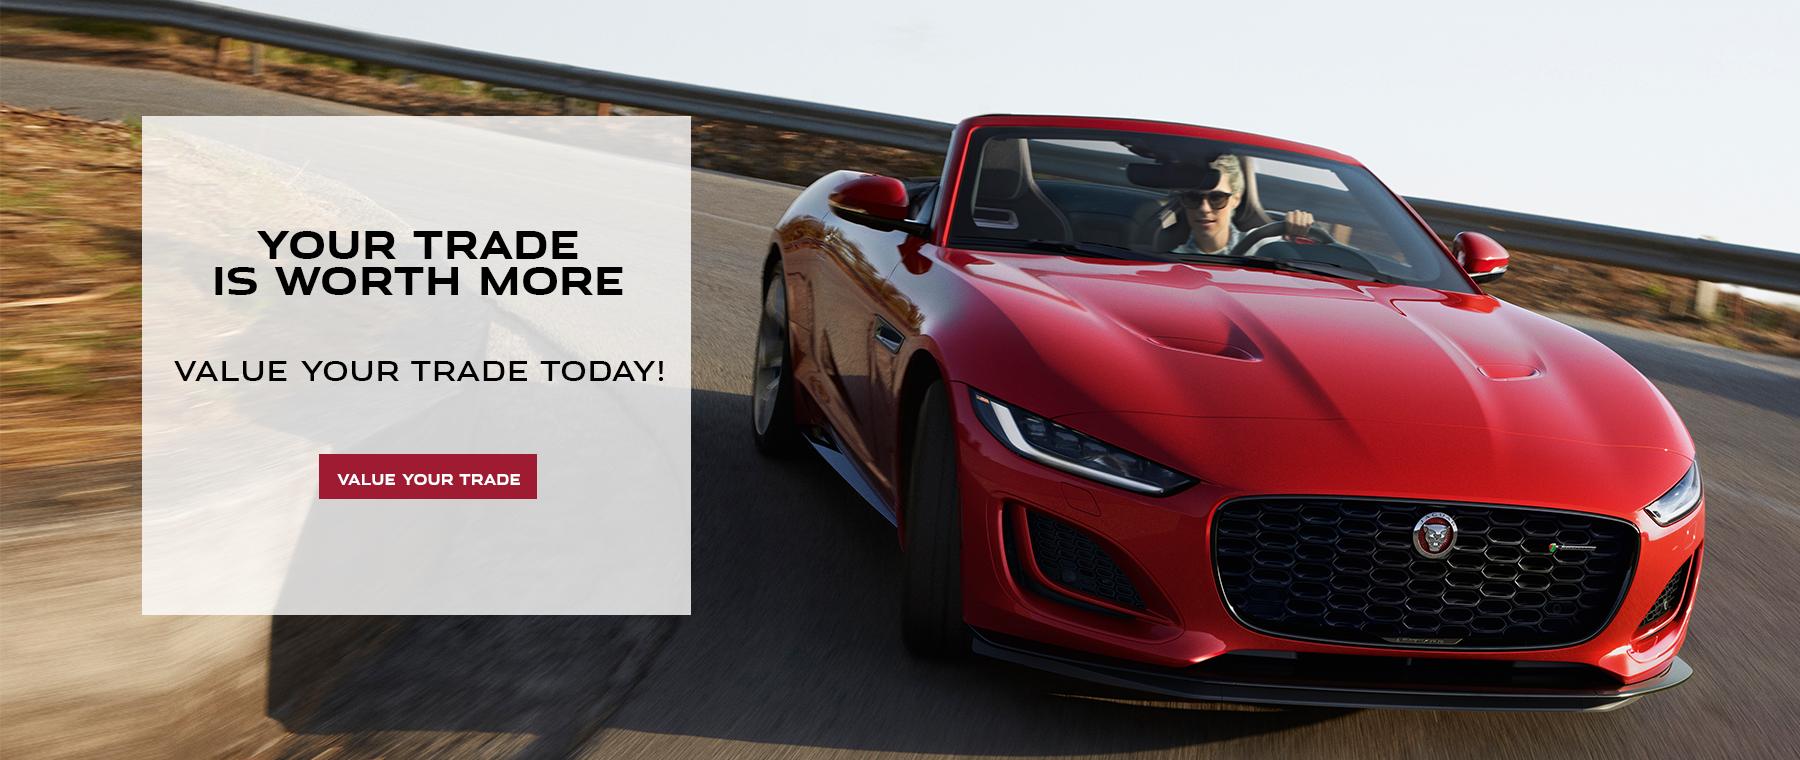 Jaguar Trade In. Value Your Trade,